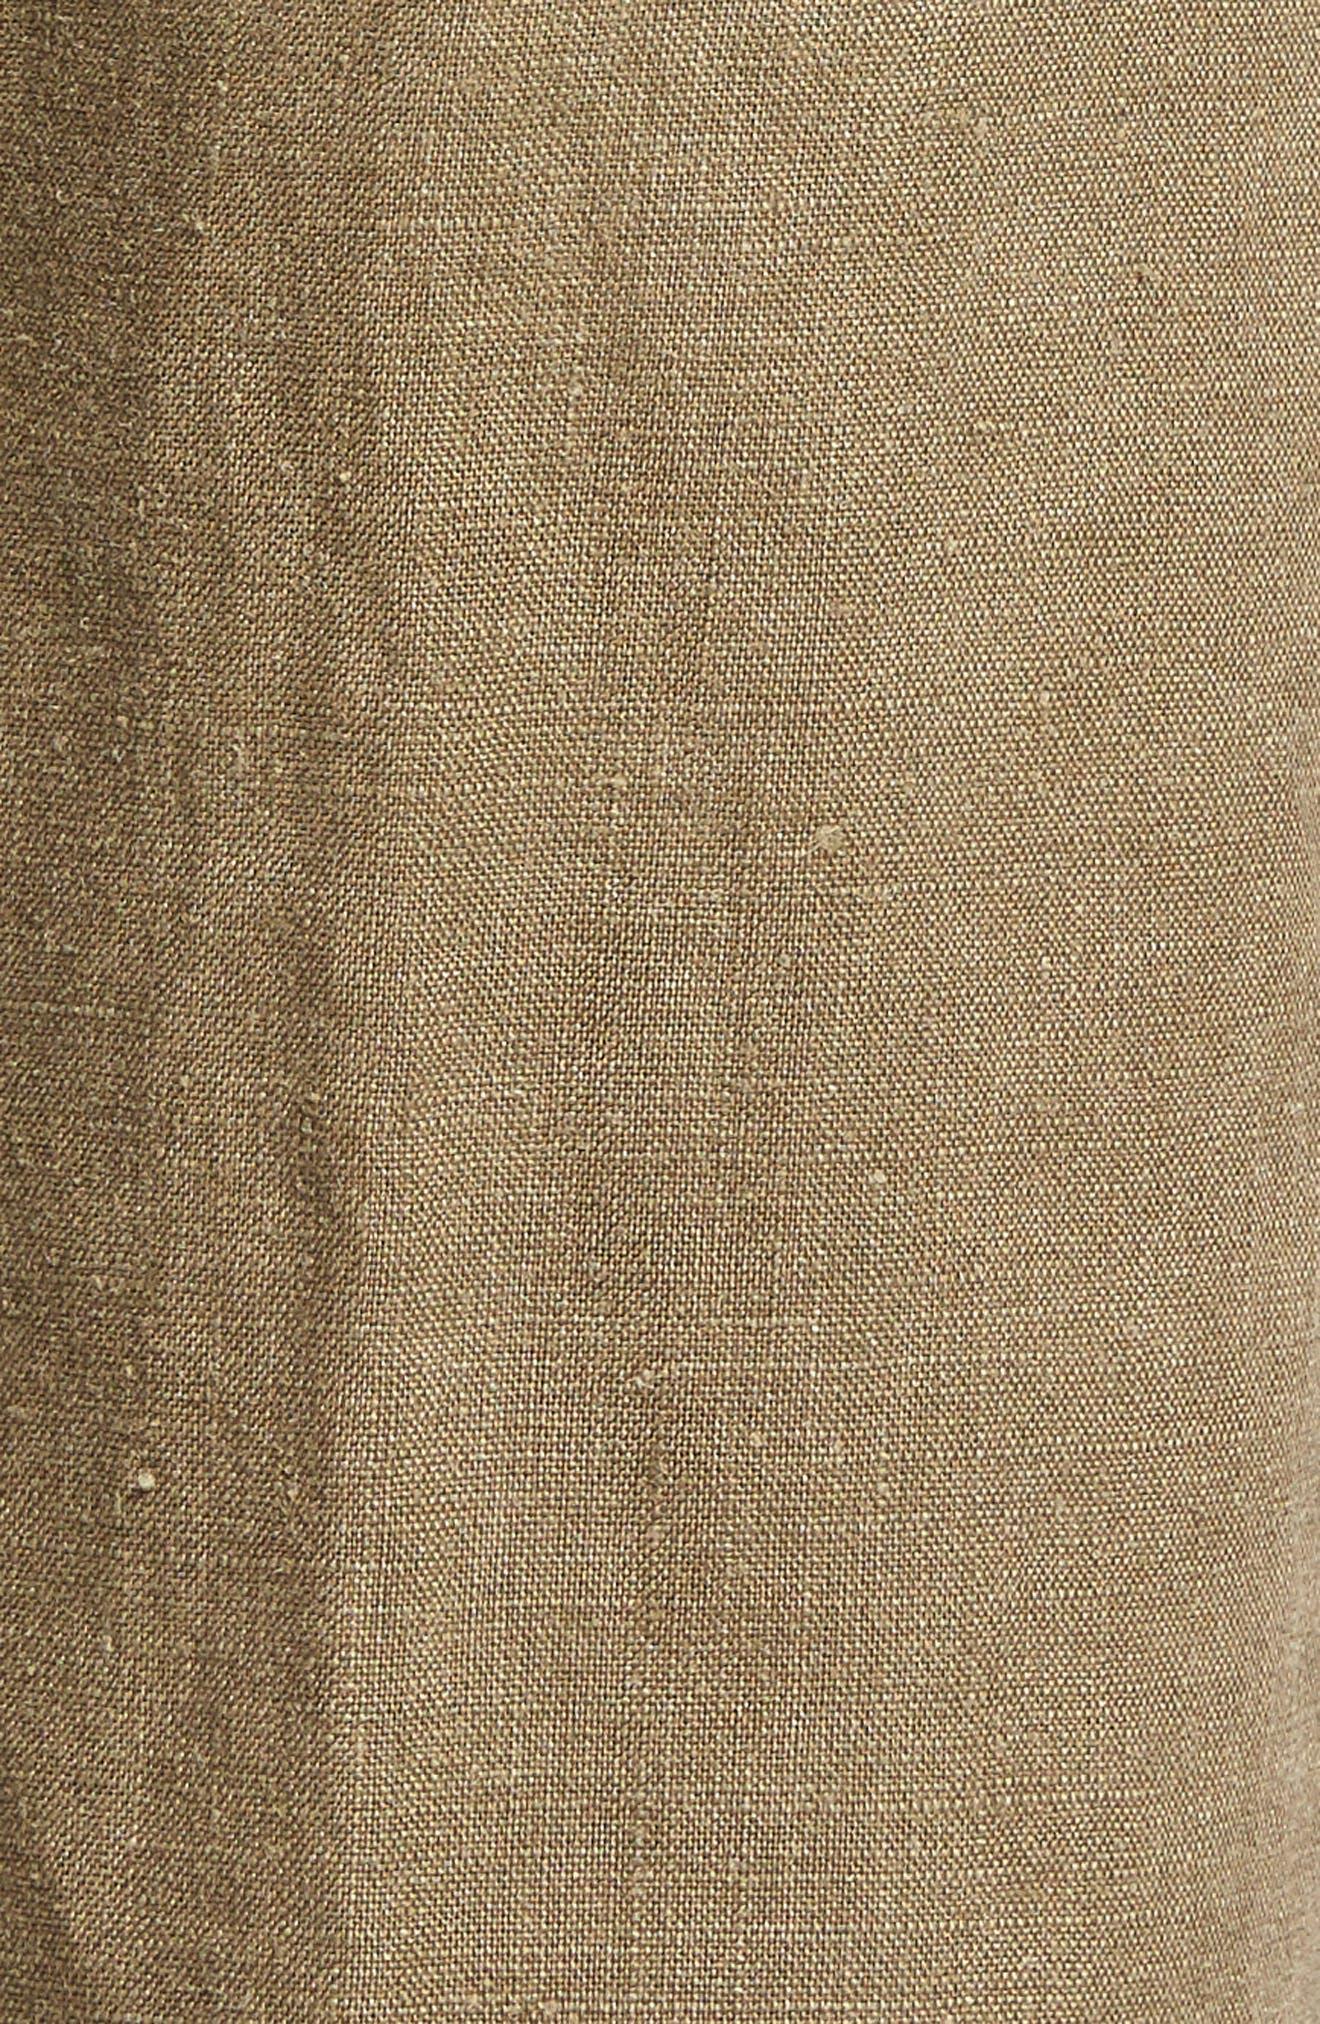 New Linen on the Beach Linen Pants,                             Alternate thumbnail 25, color,